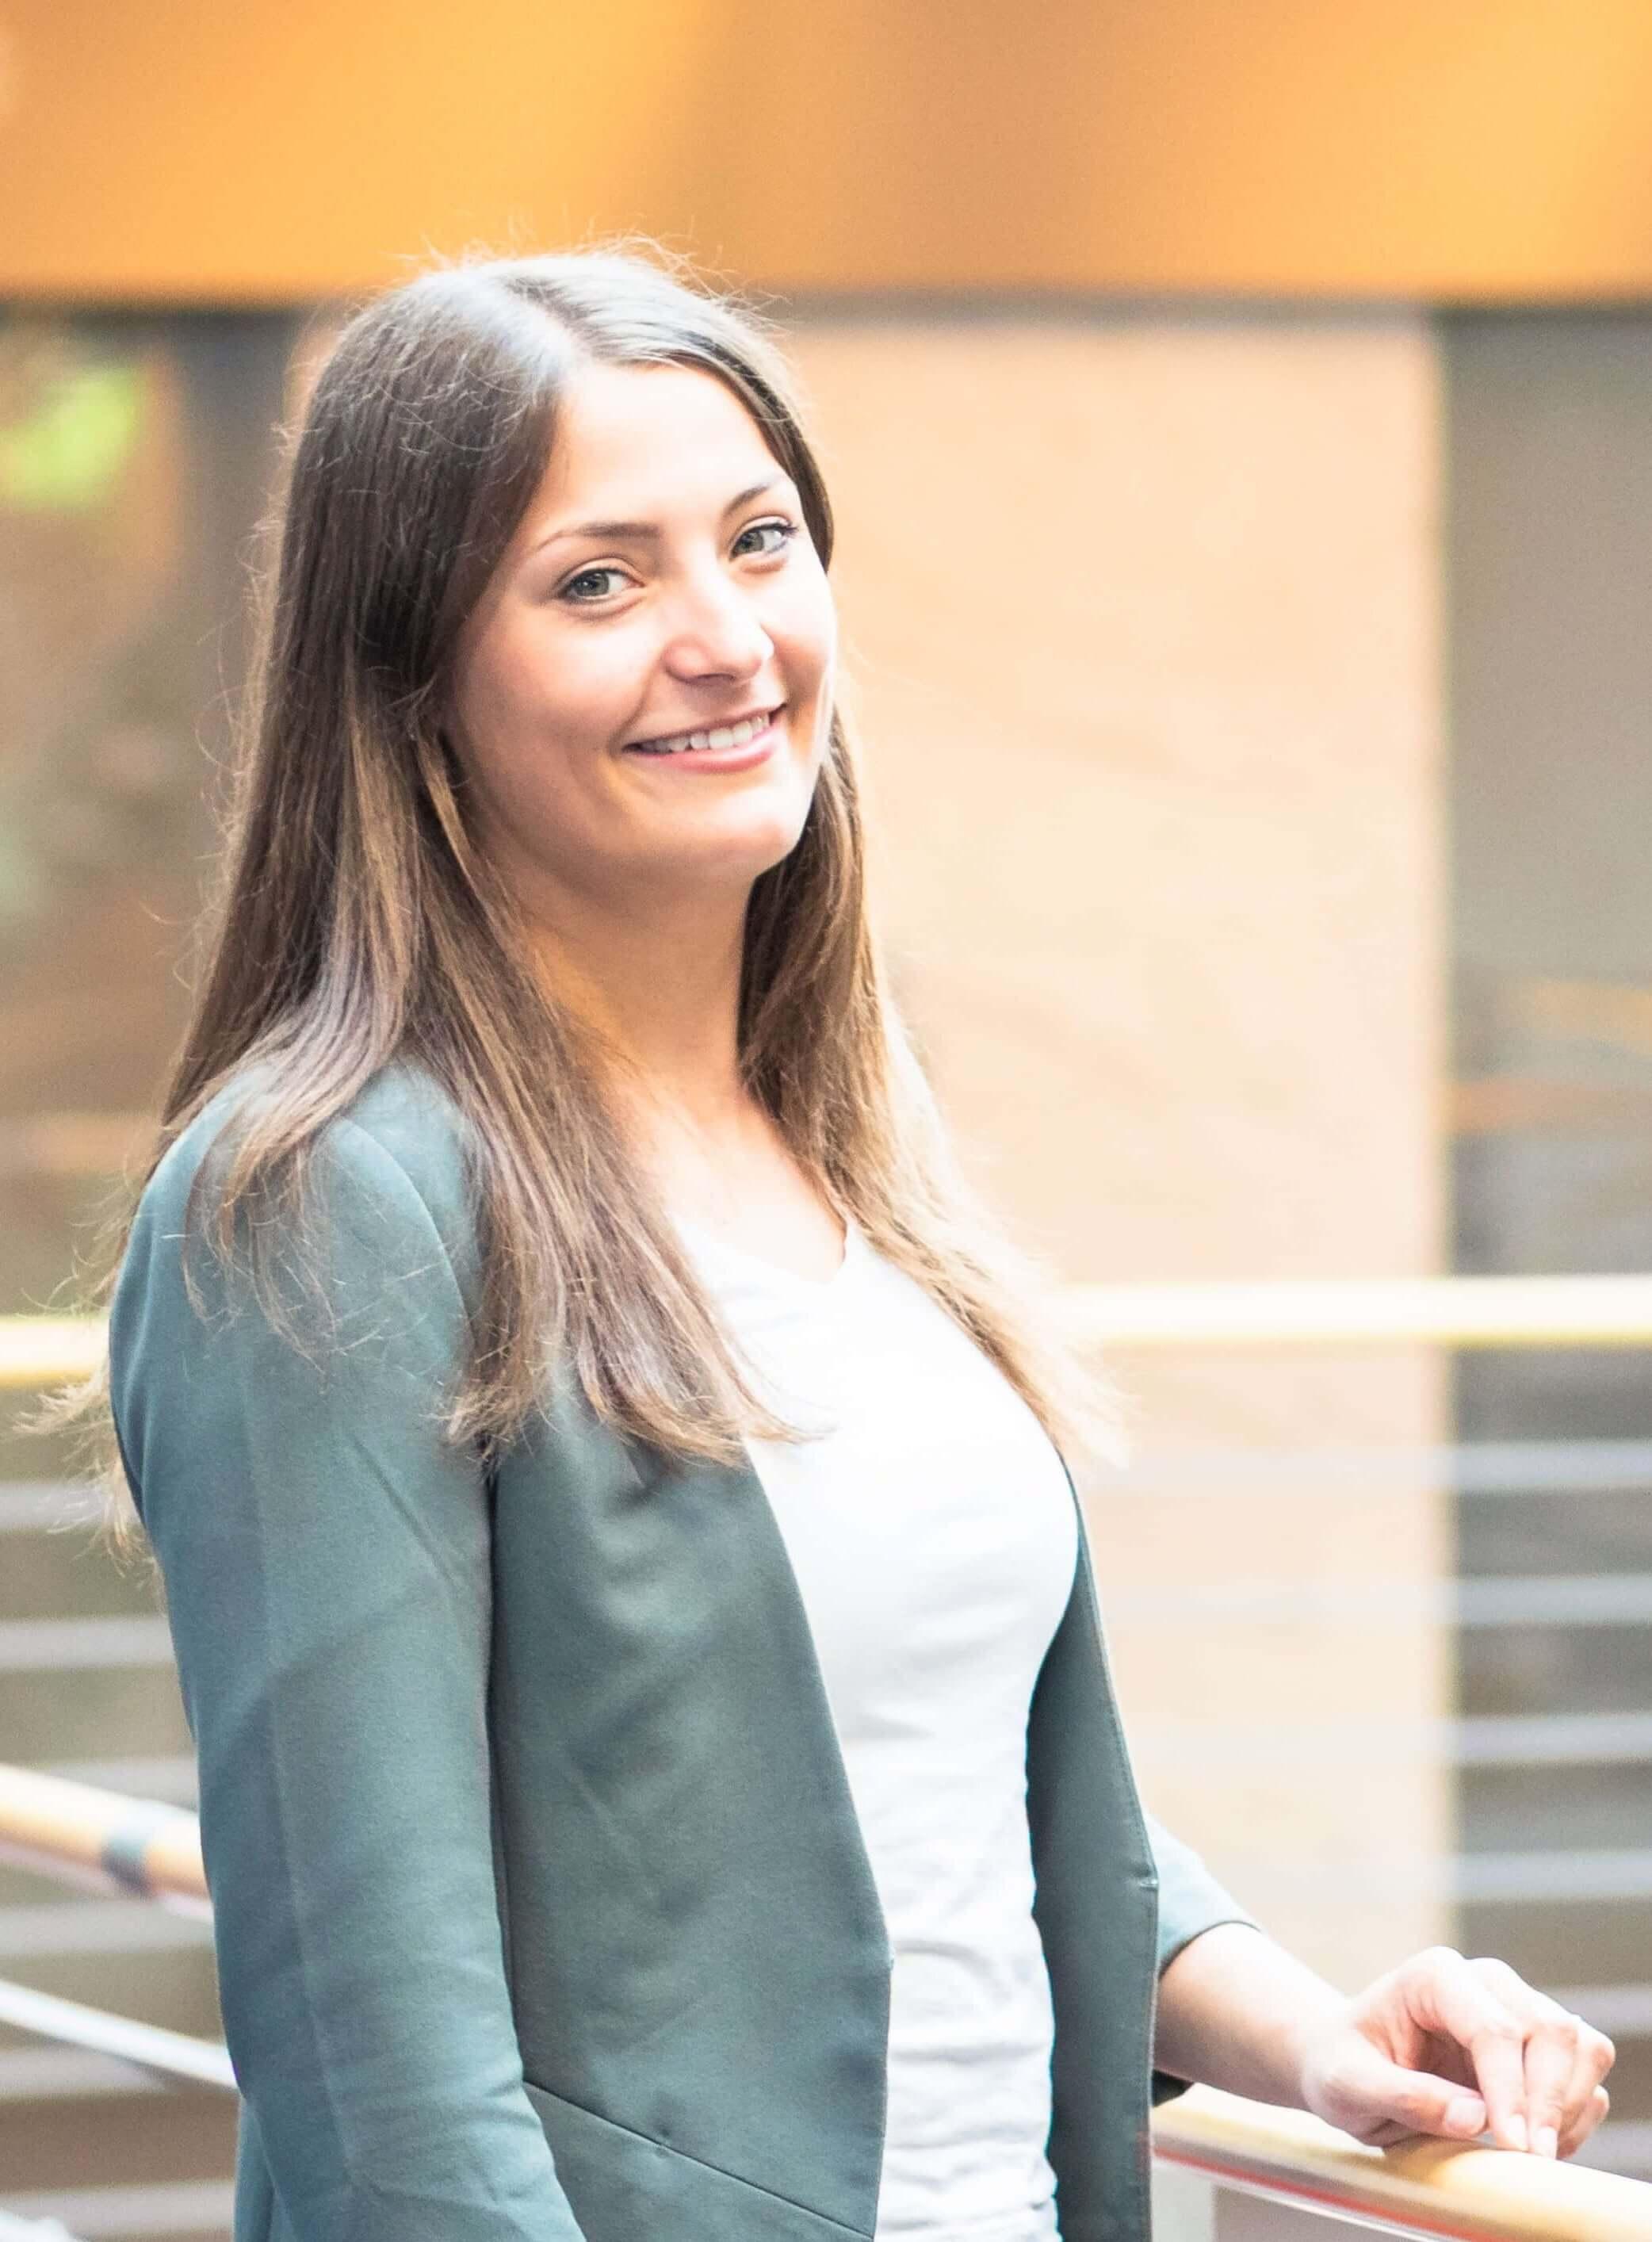 SEA-Agentur Stuttgart Expertin Miriam Abels